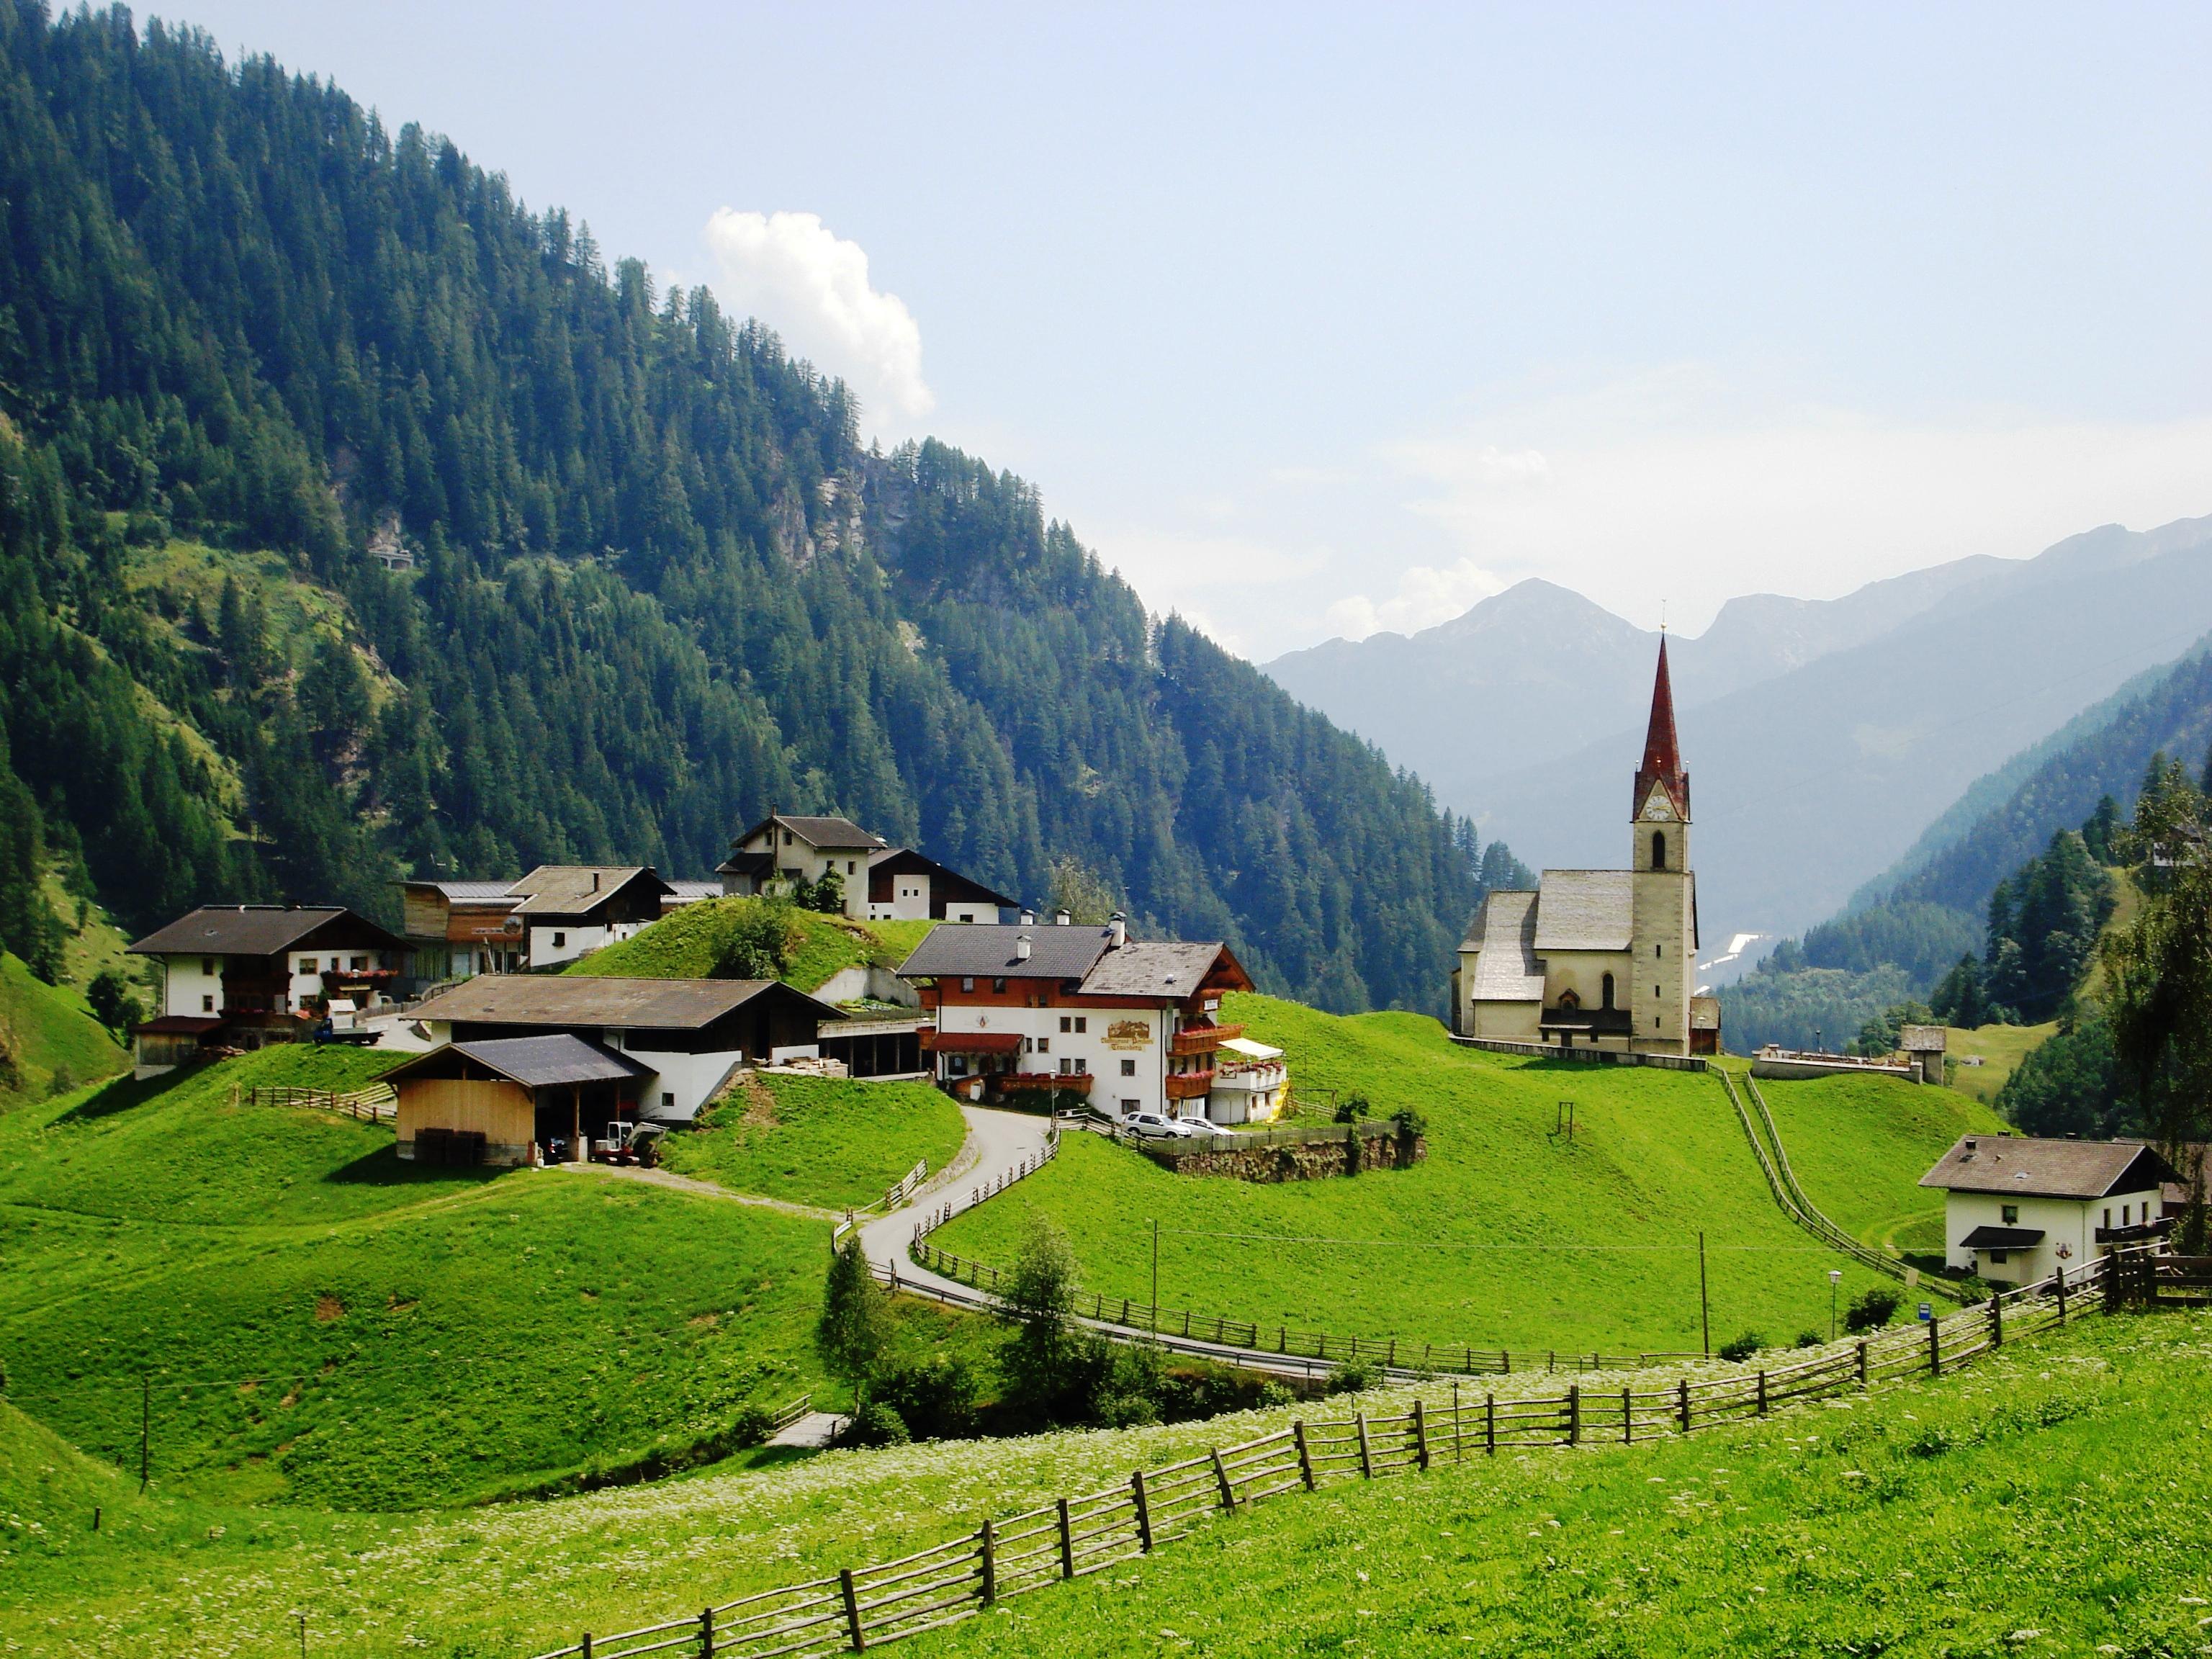 Austria Wallpaper Hd A Short Walk Across The Alps A View From The Breakwater